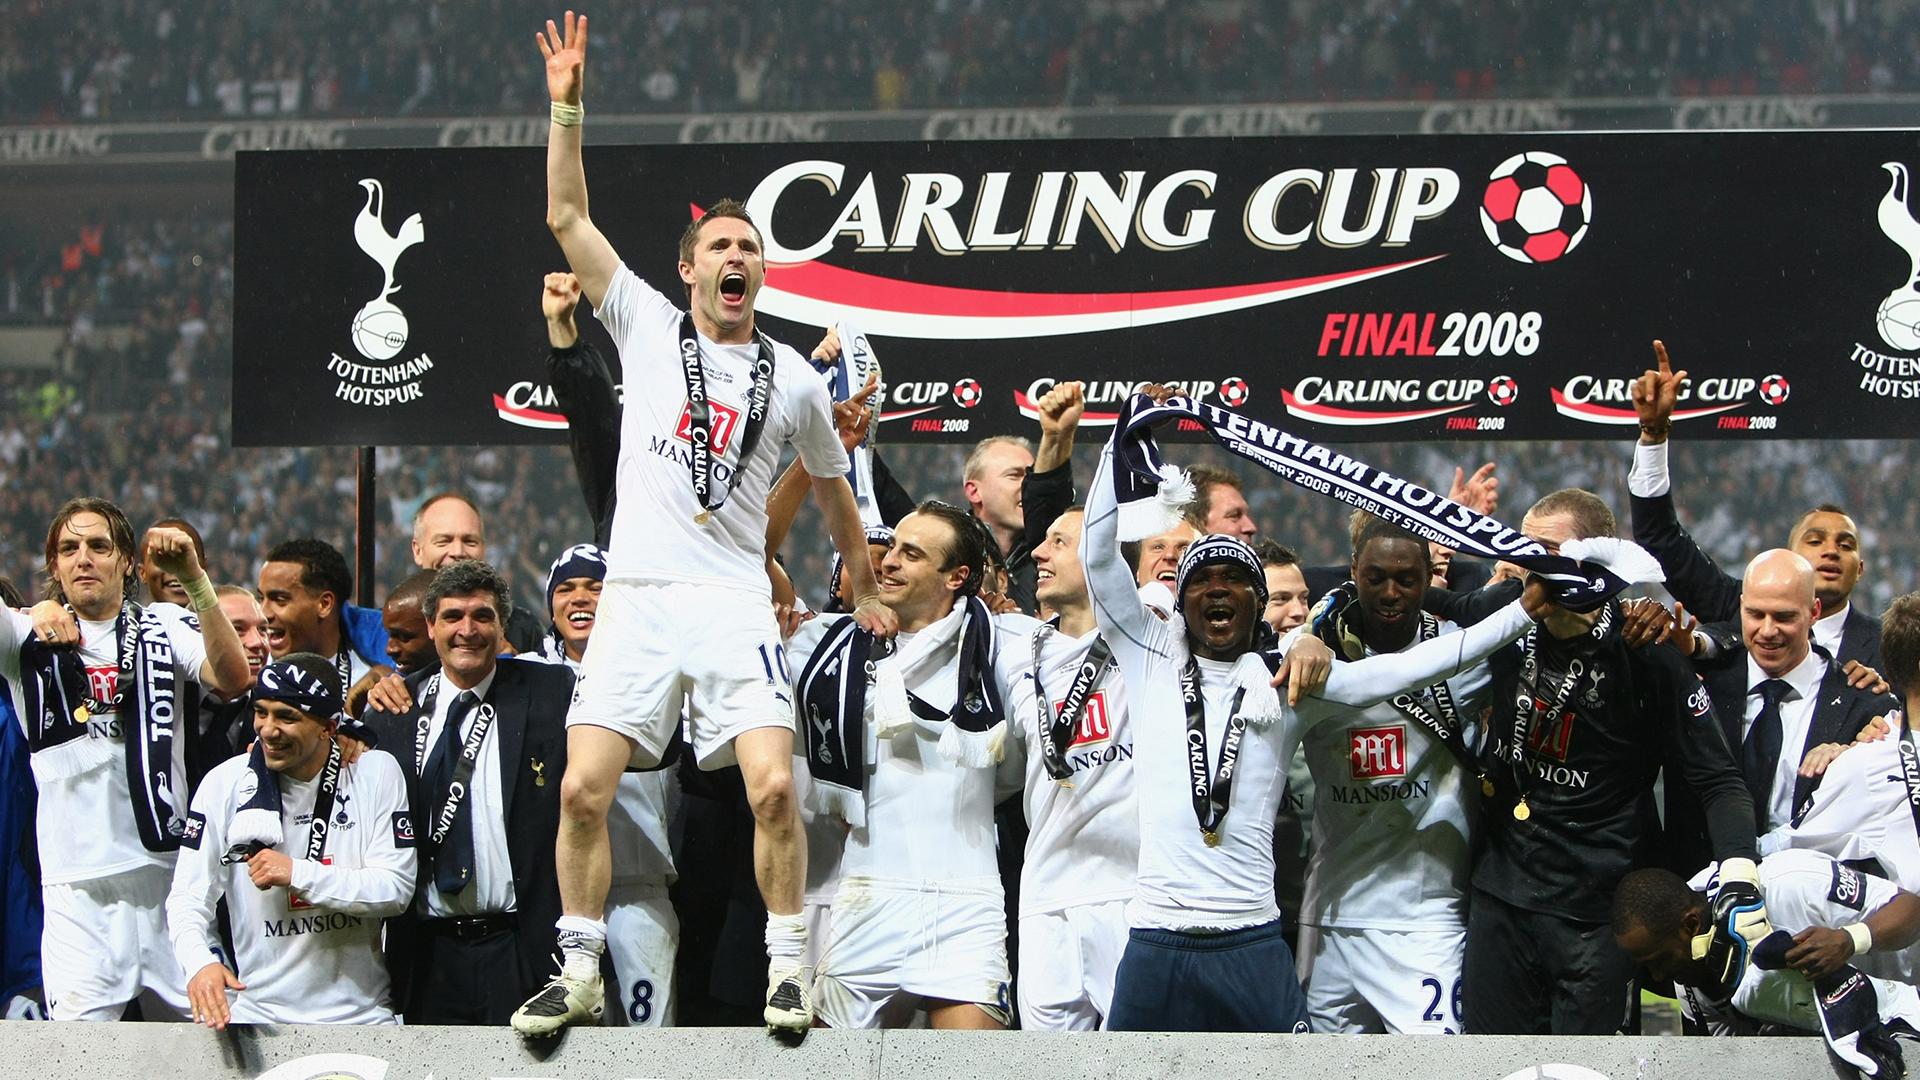 Carling Cup-triumfen i 2008